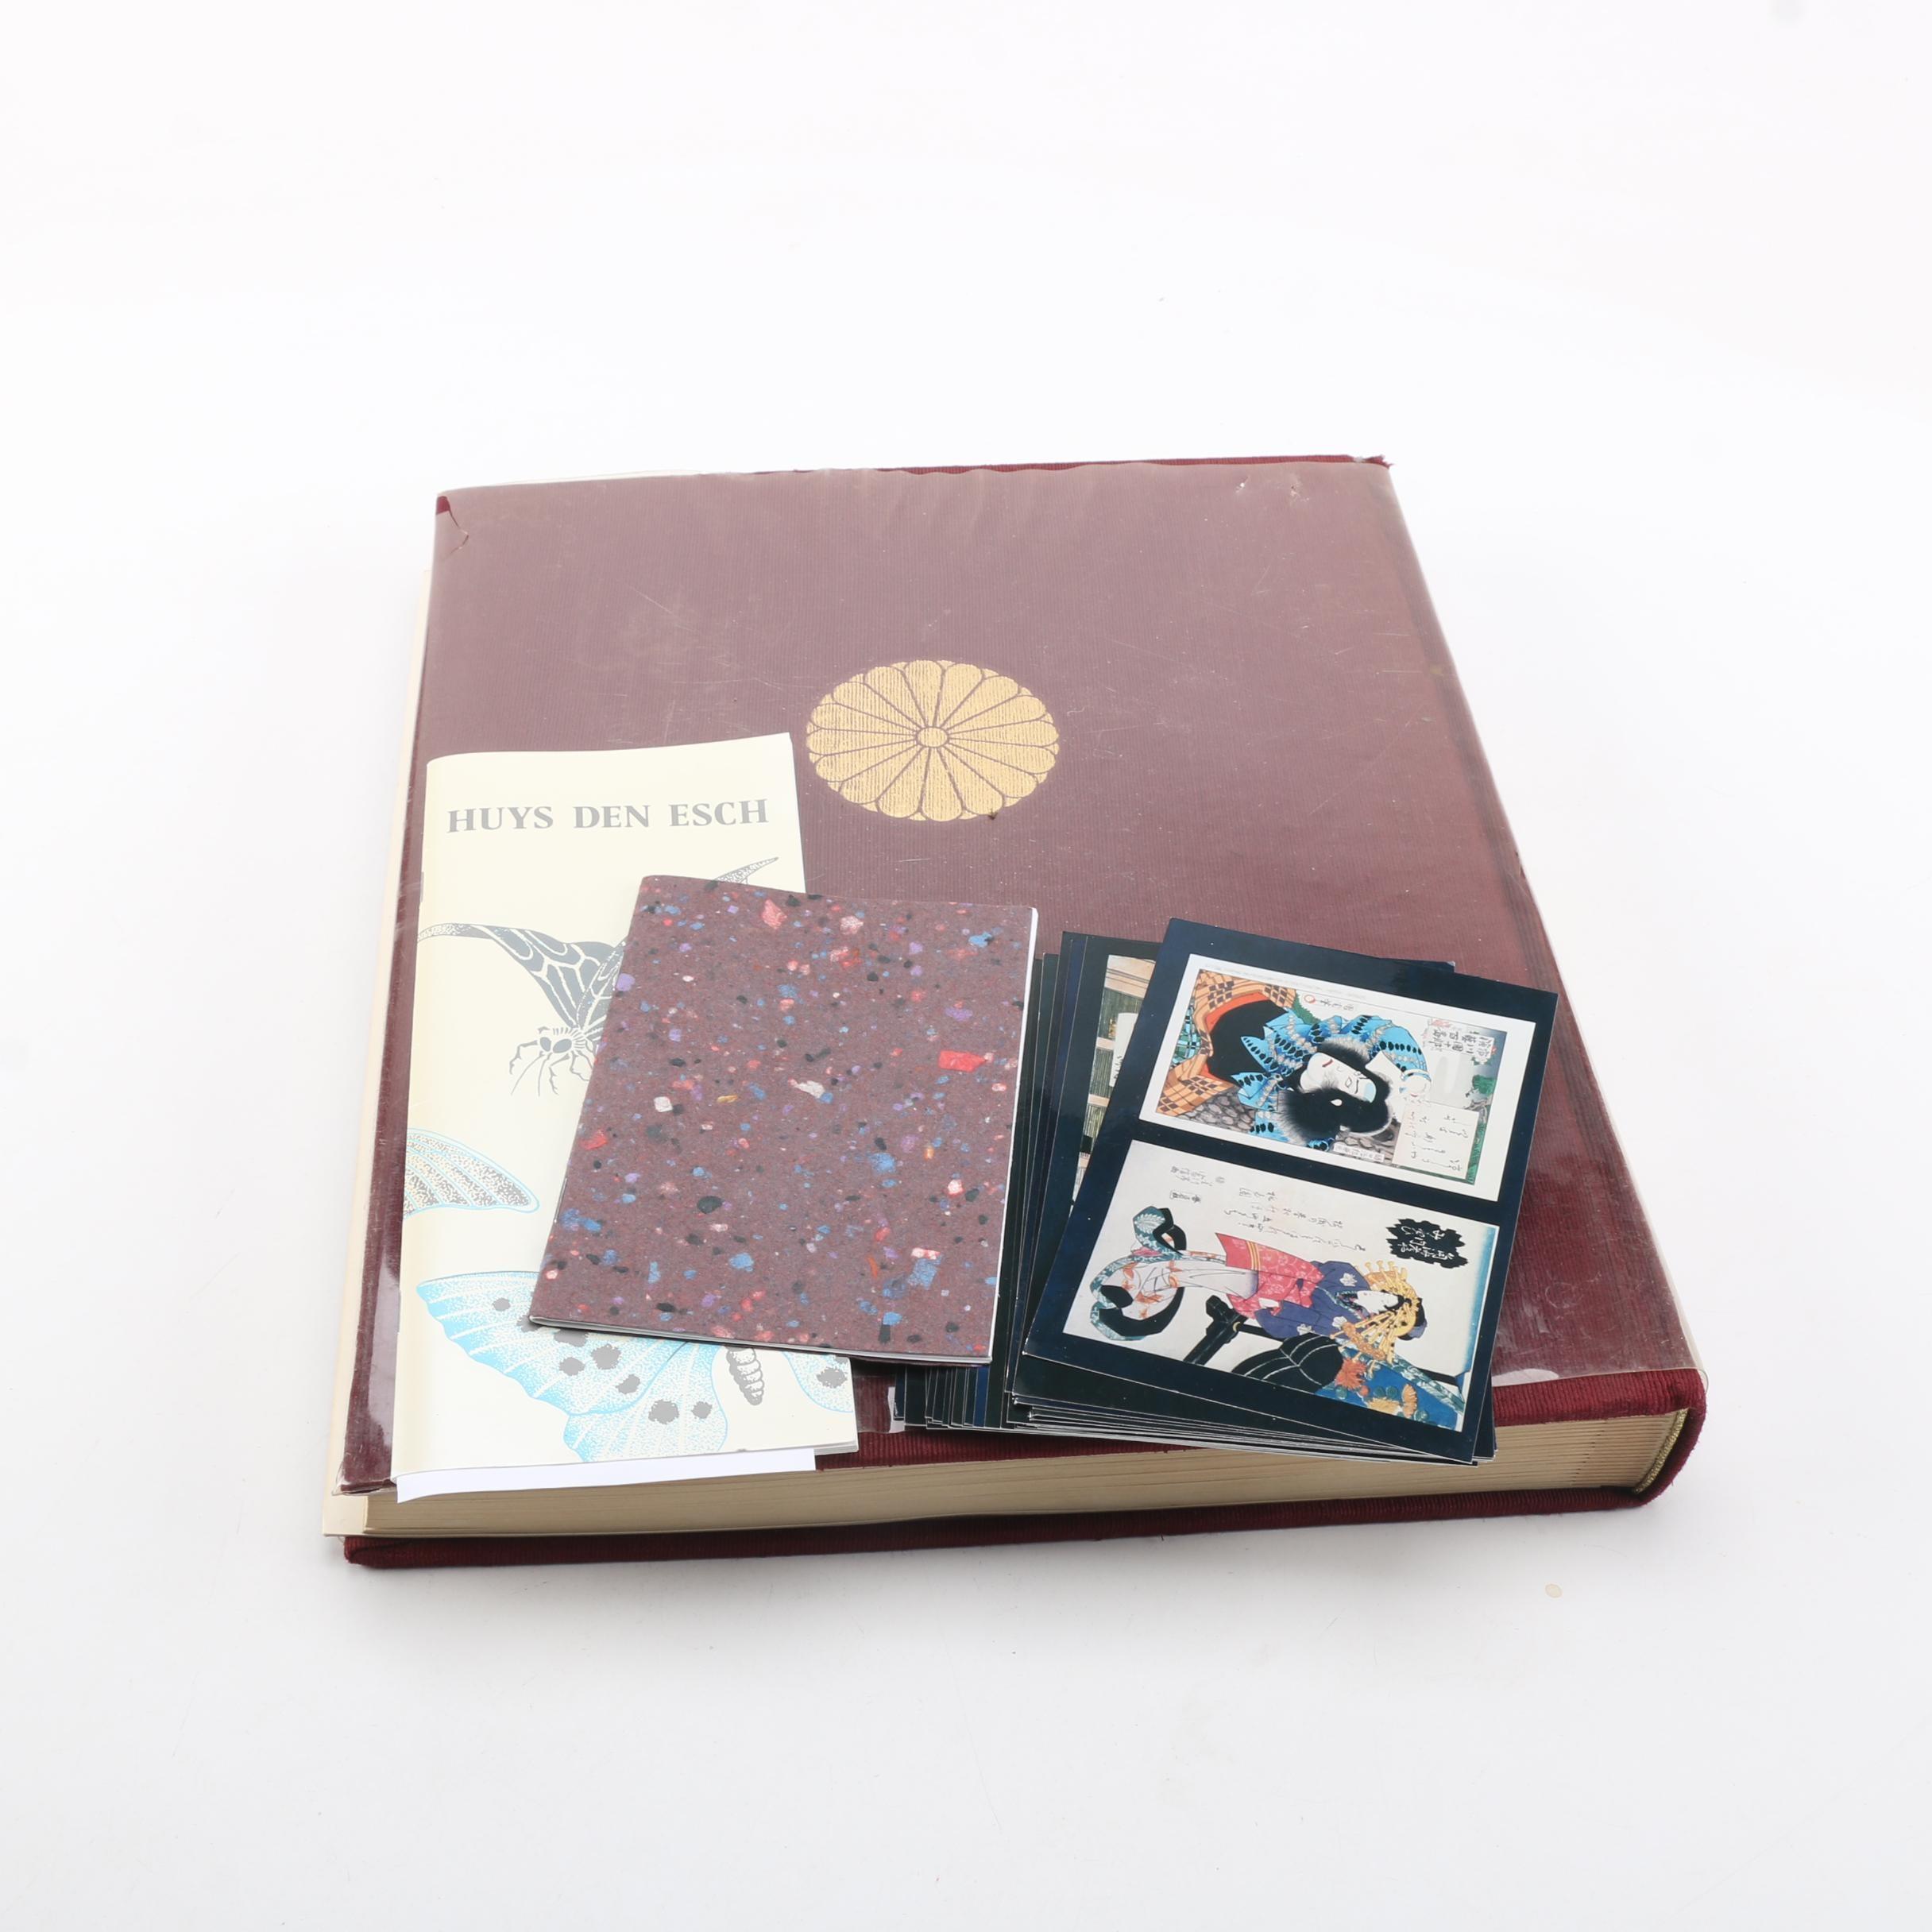 Books of Japanese Art Including 1999 Huys Den Esch Catalogue